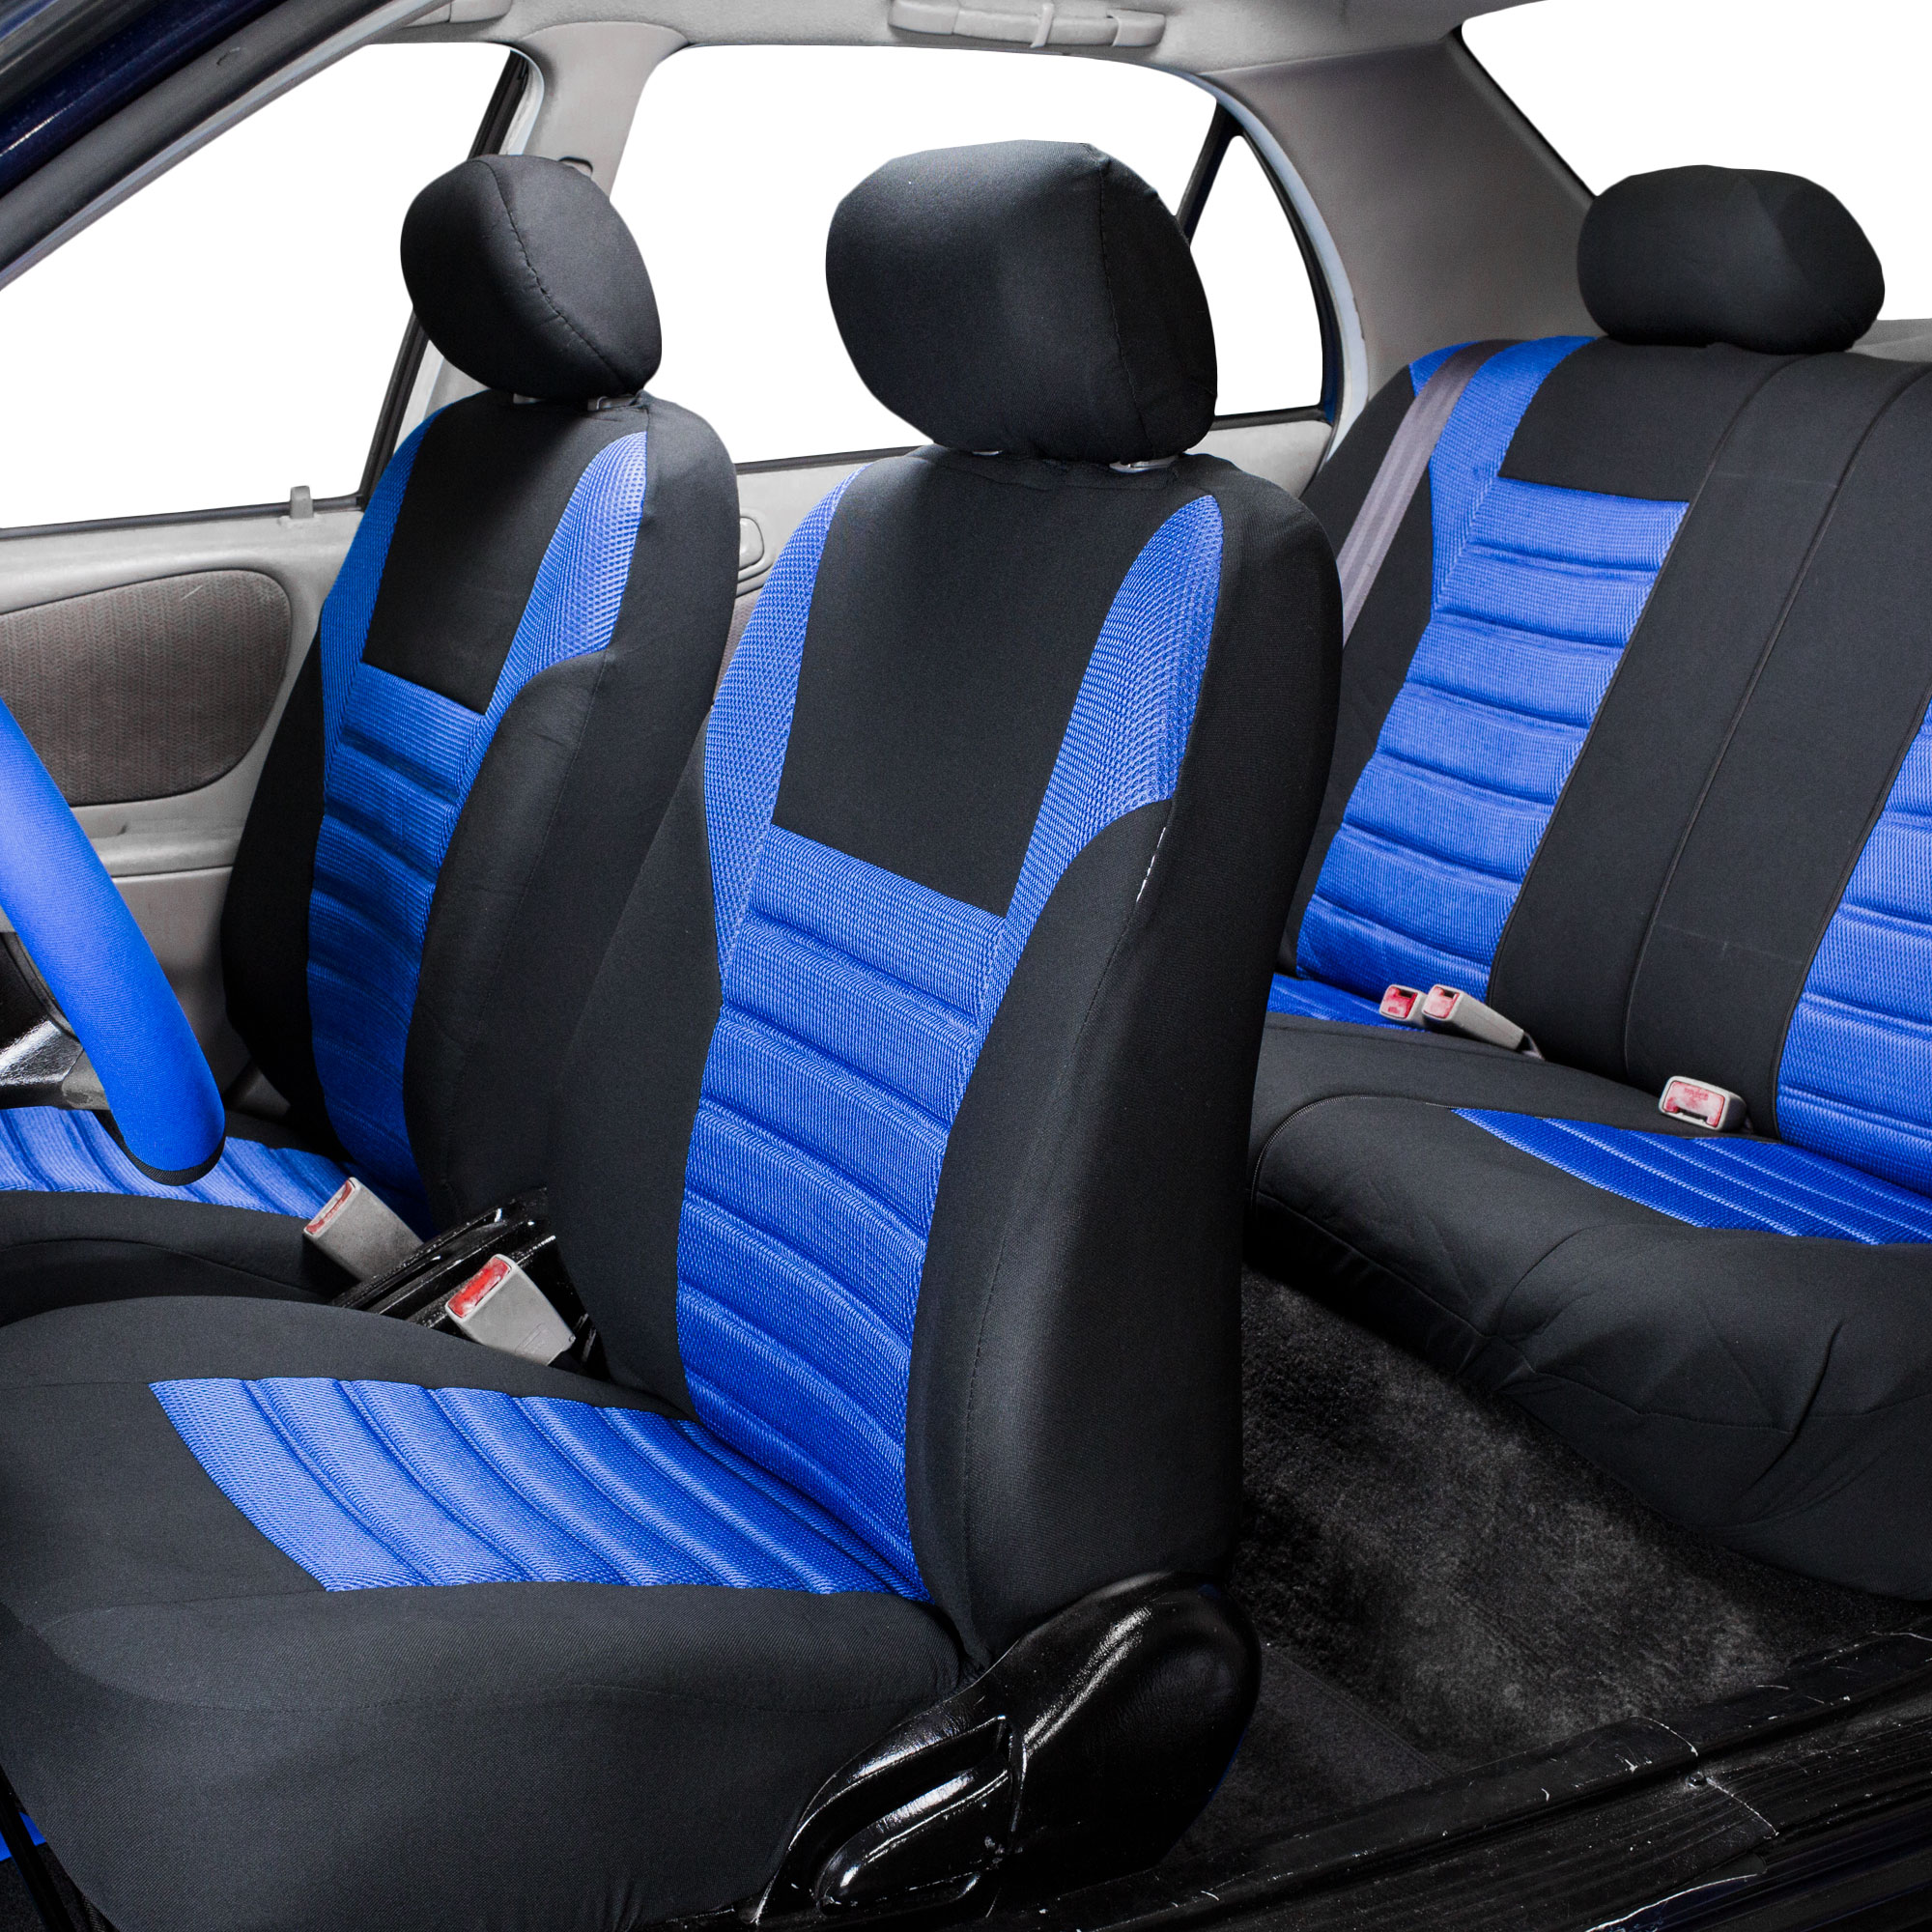 FH Group Premium Air Mesh Seat Covers for Auto Car SUV Van, Full Set, 11 Colors